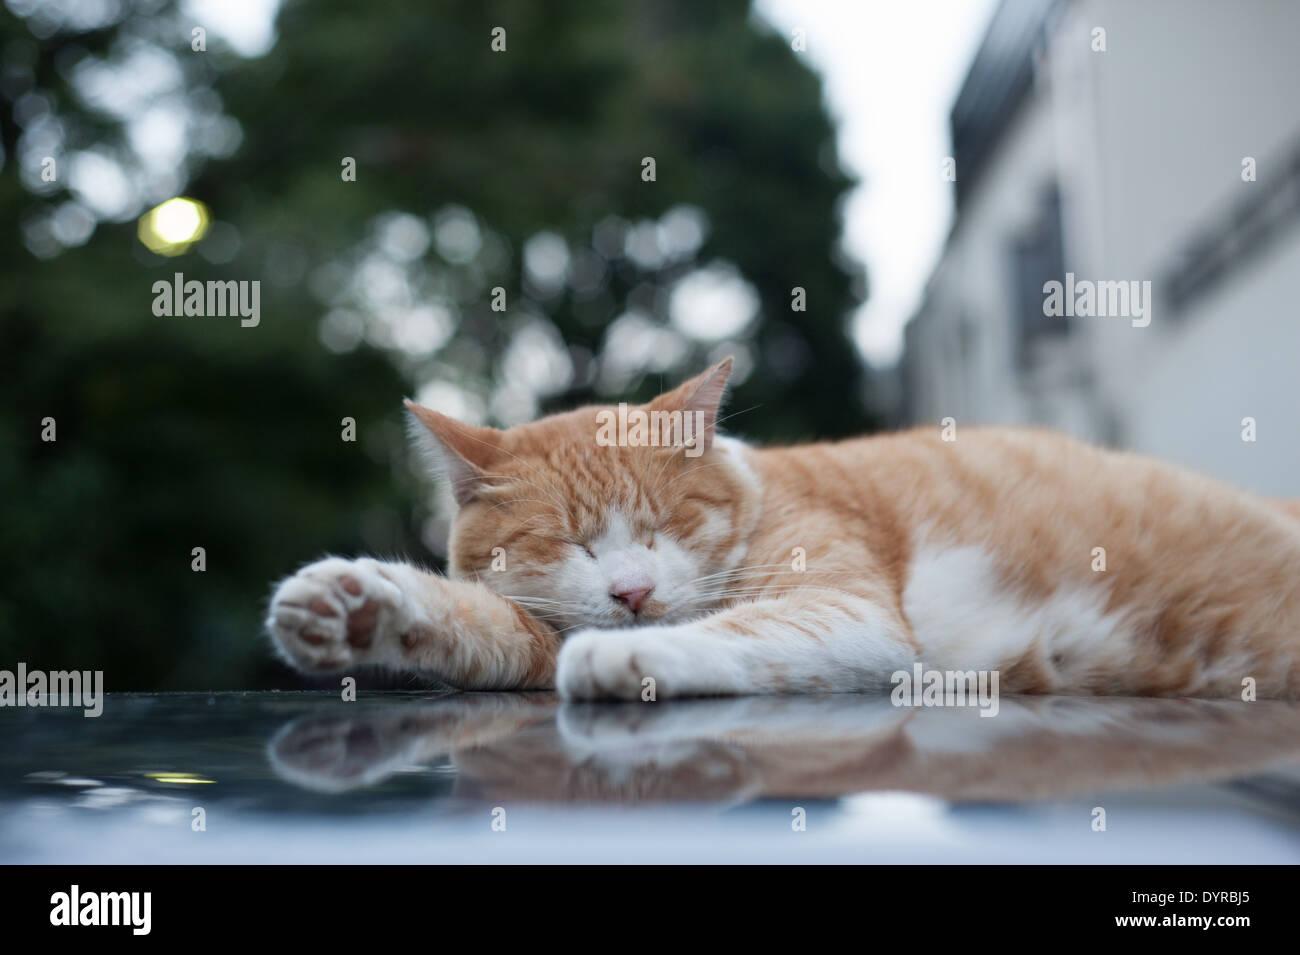 Cat sleeping on a car, Tokyo, Japan - Stock Image